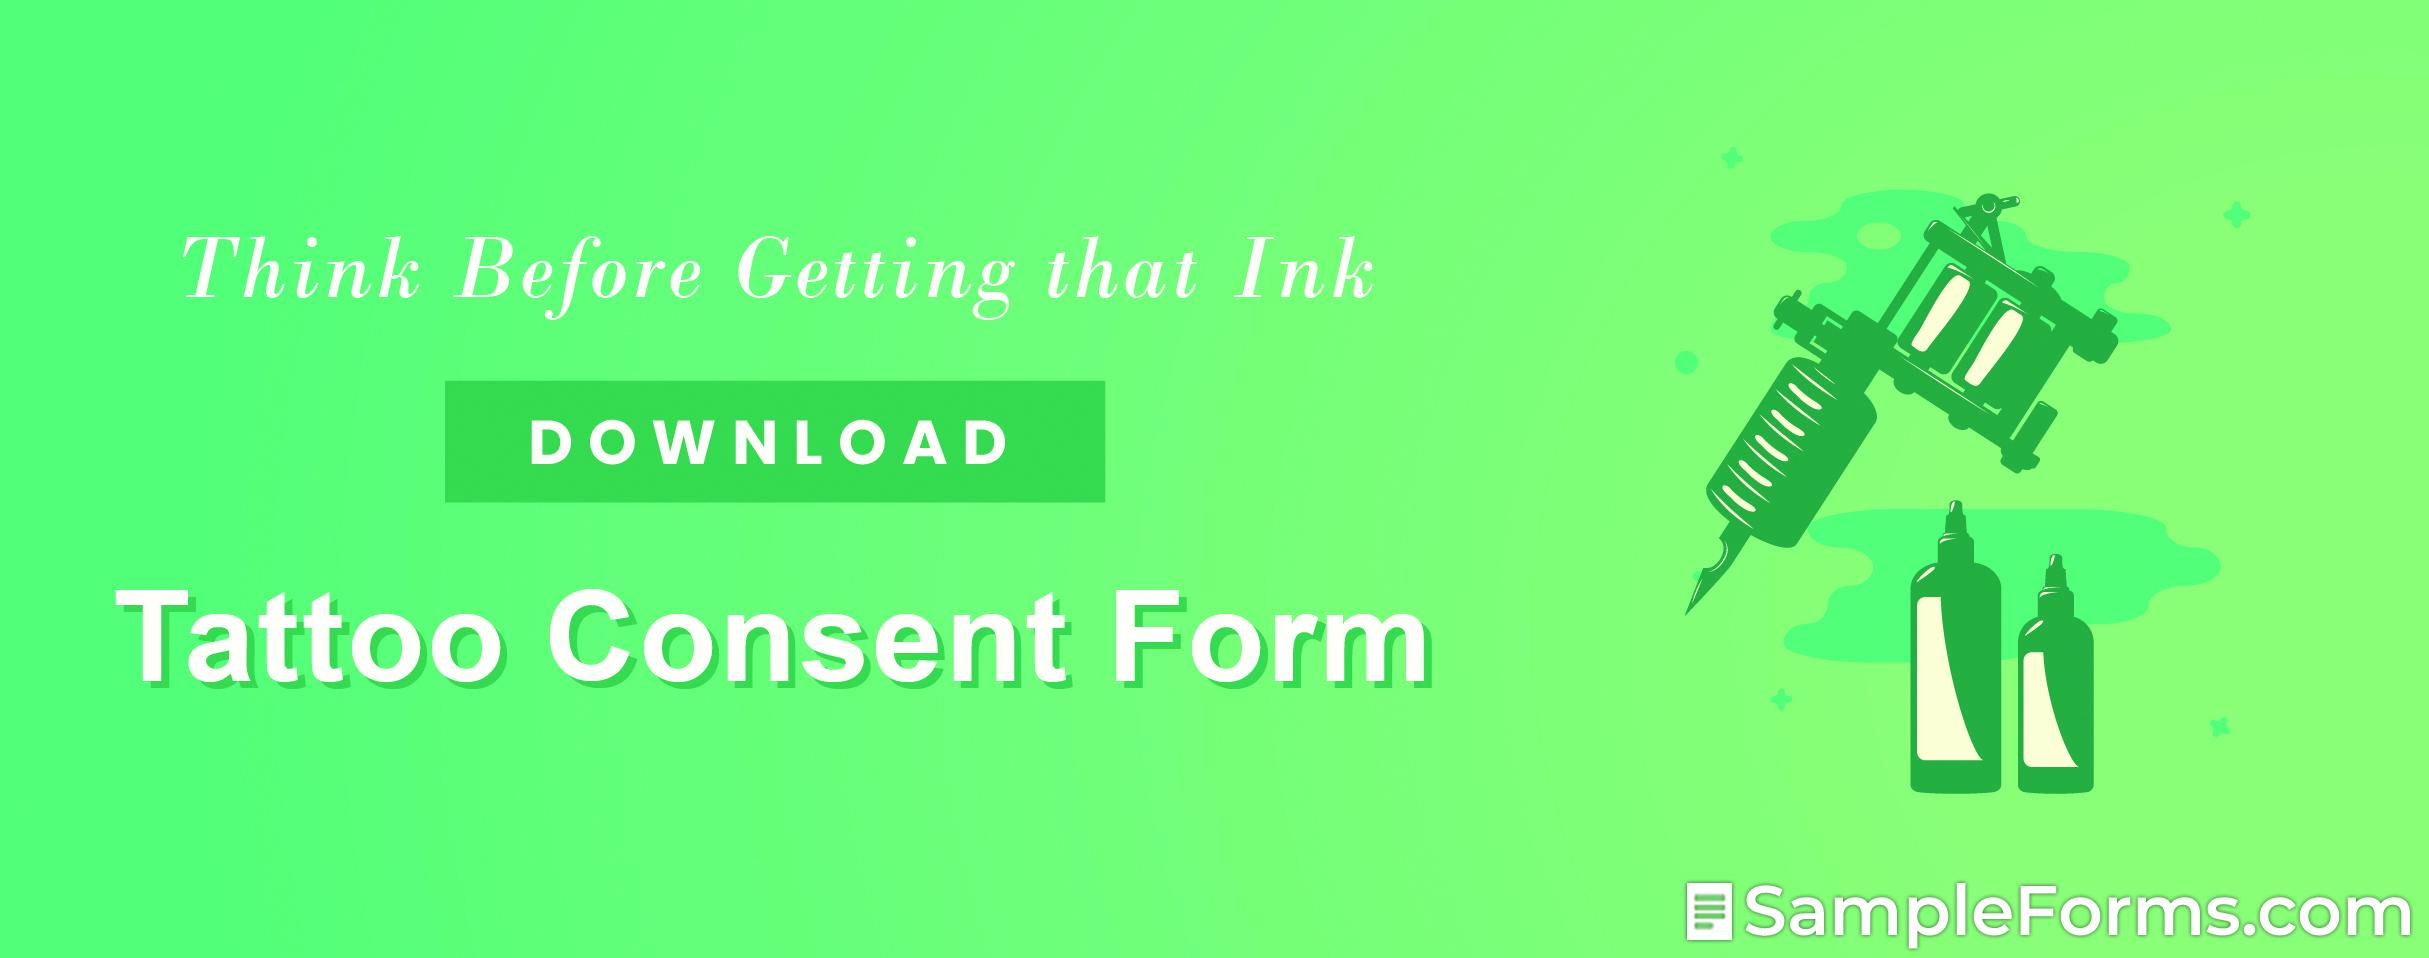 Tattoo Consent Form2